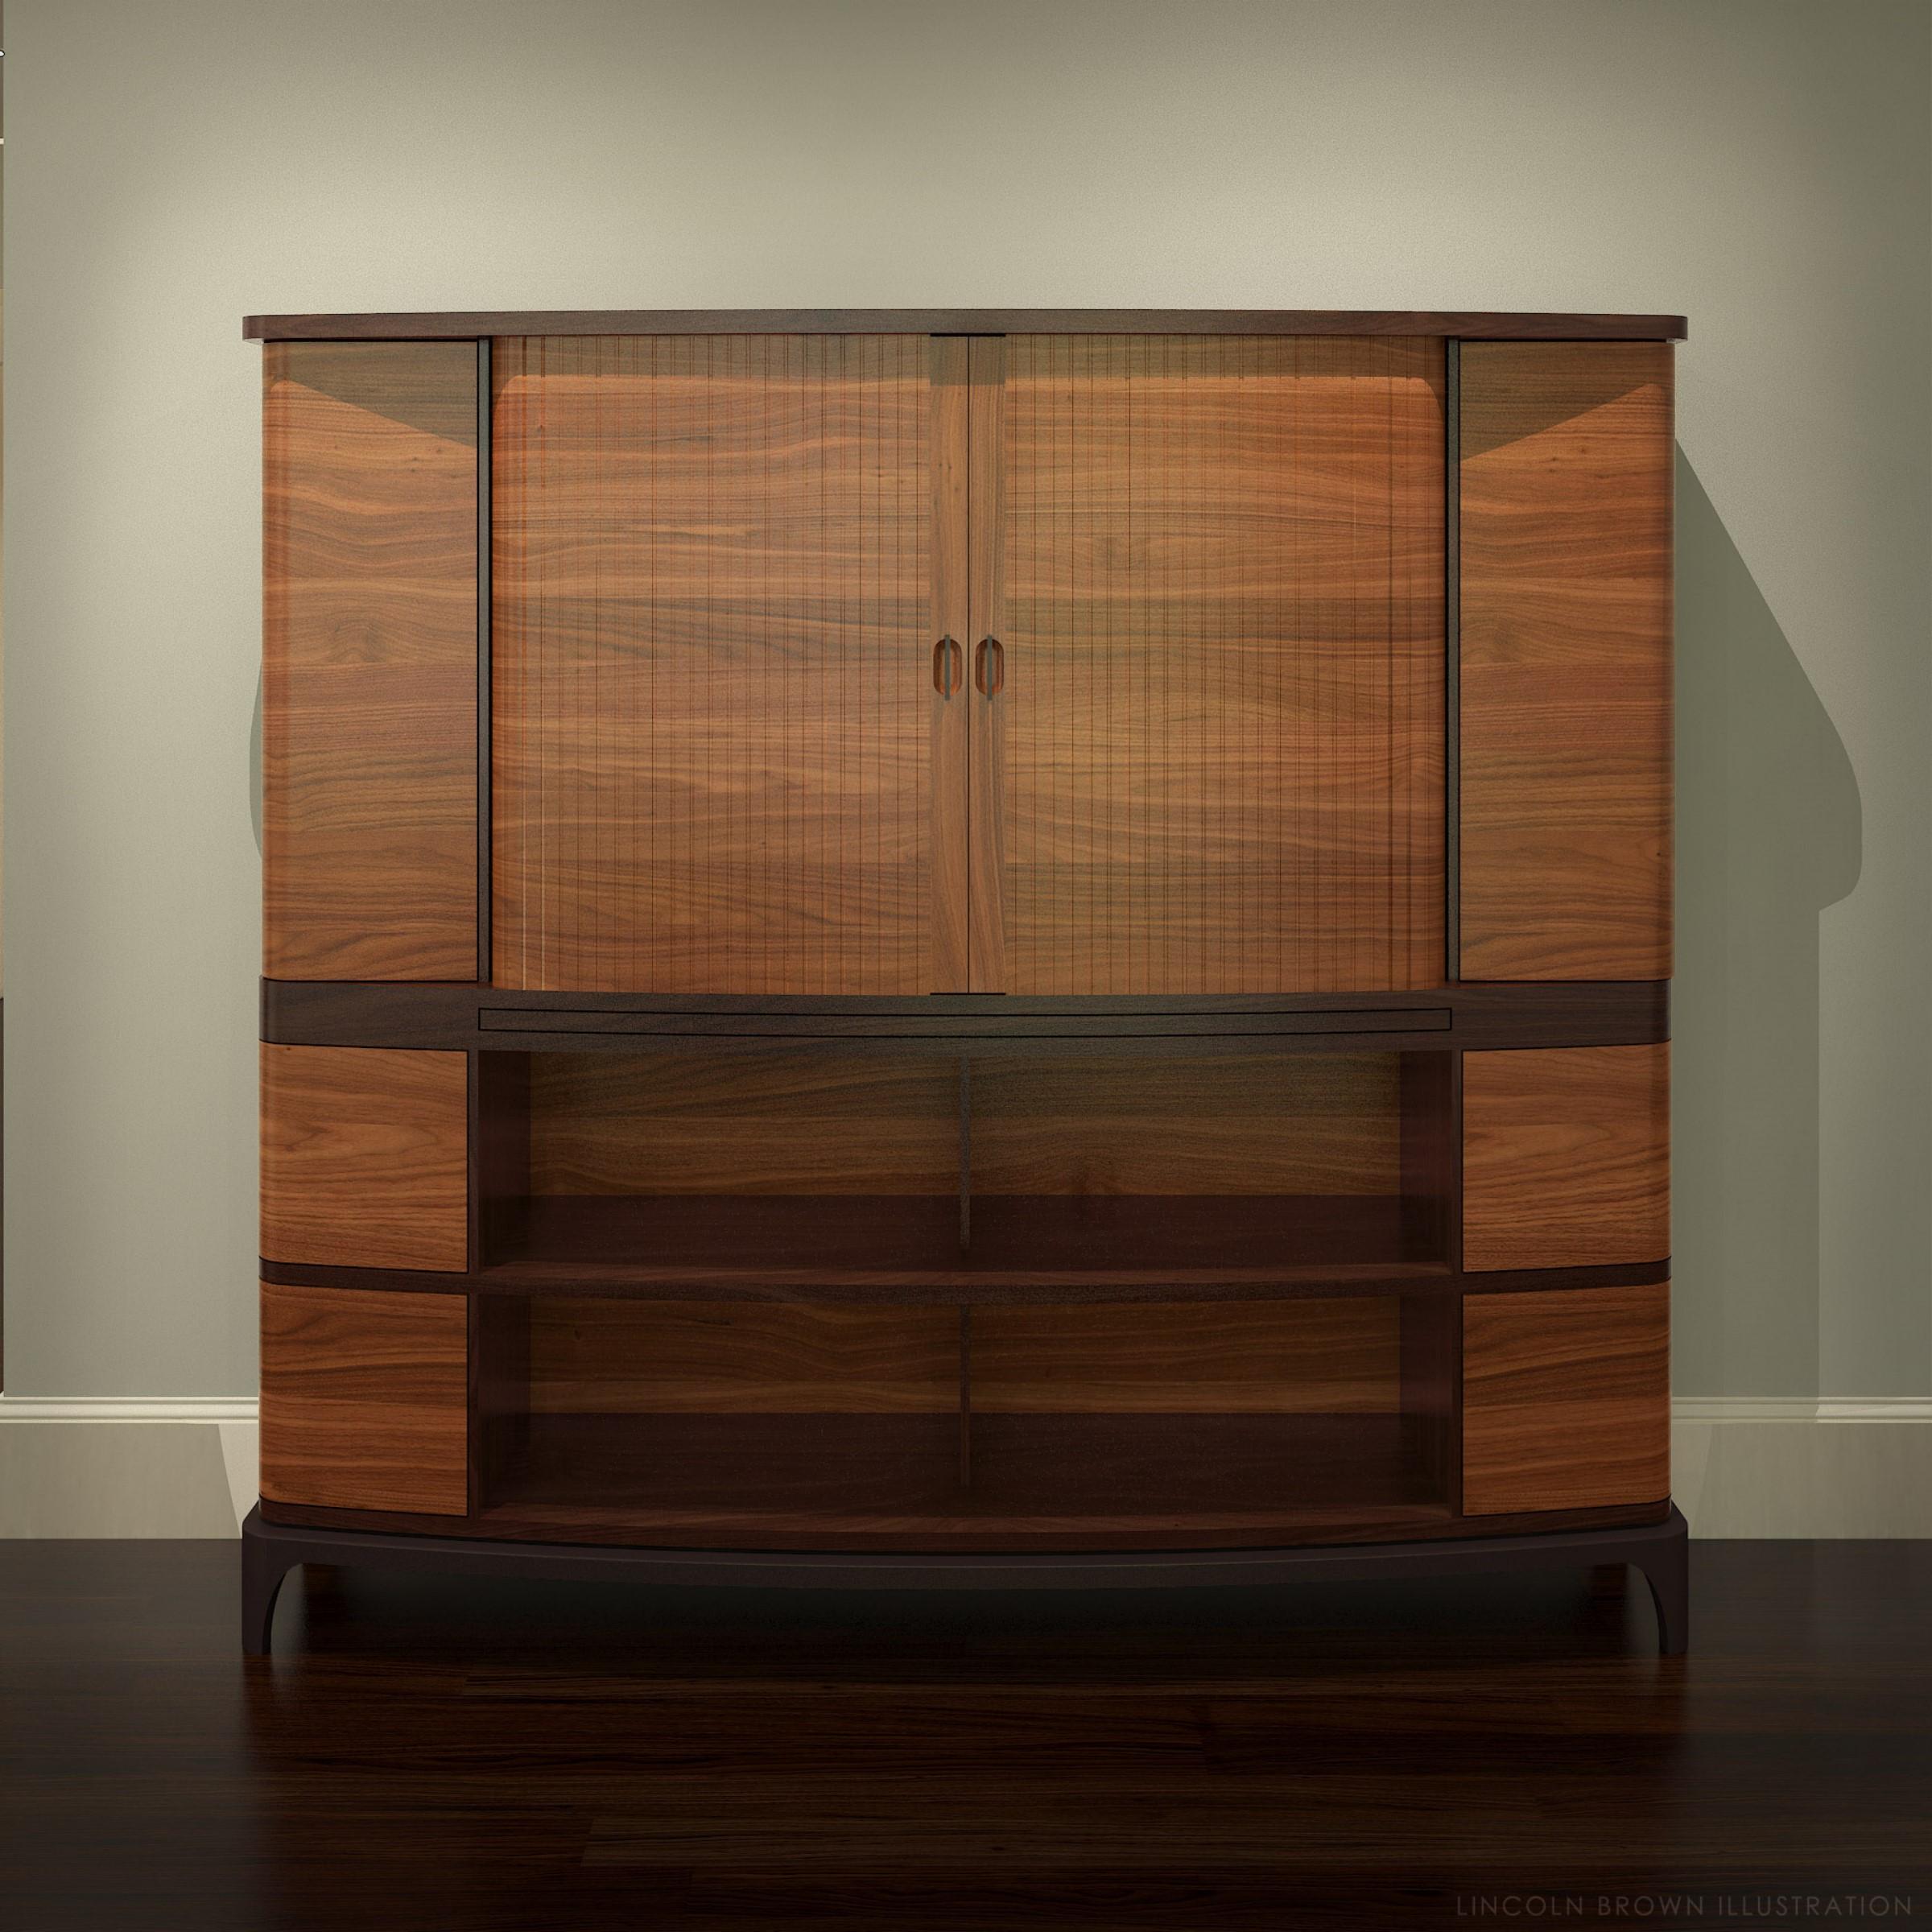 2016-08 Abramson Weston - Cabinet01 closed c03.jpg